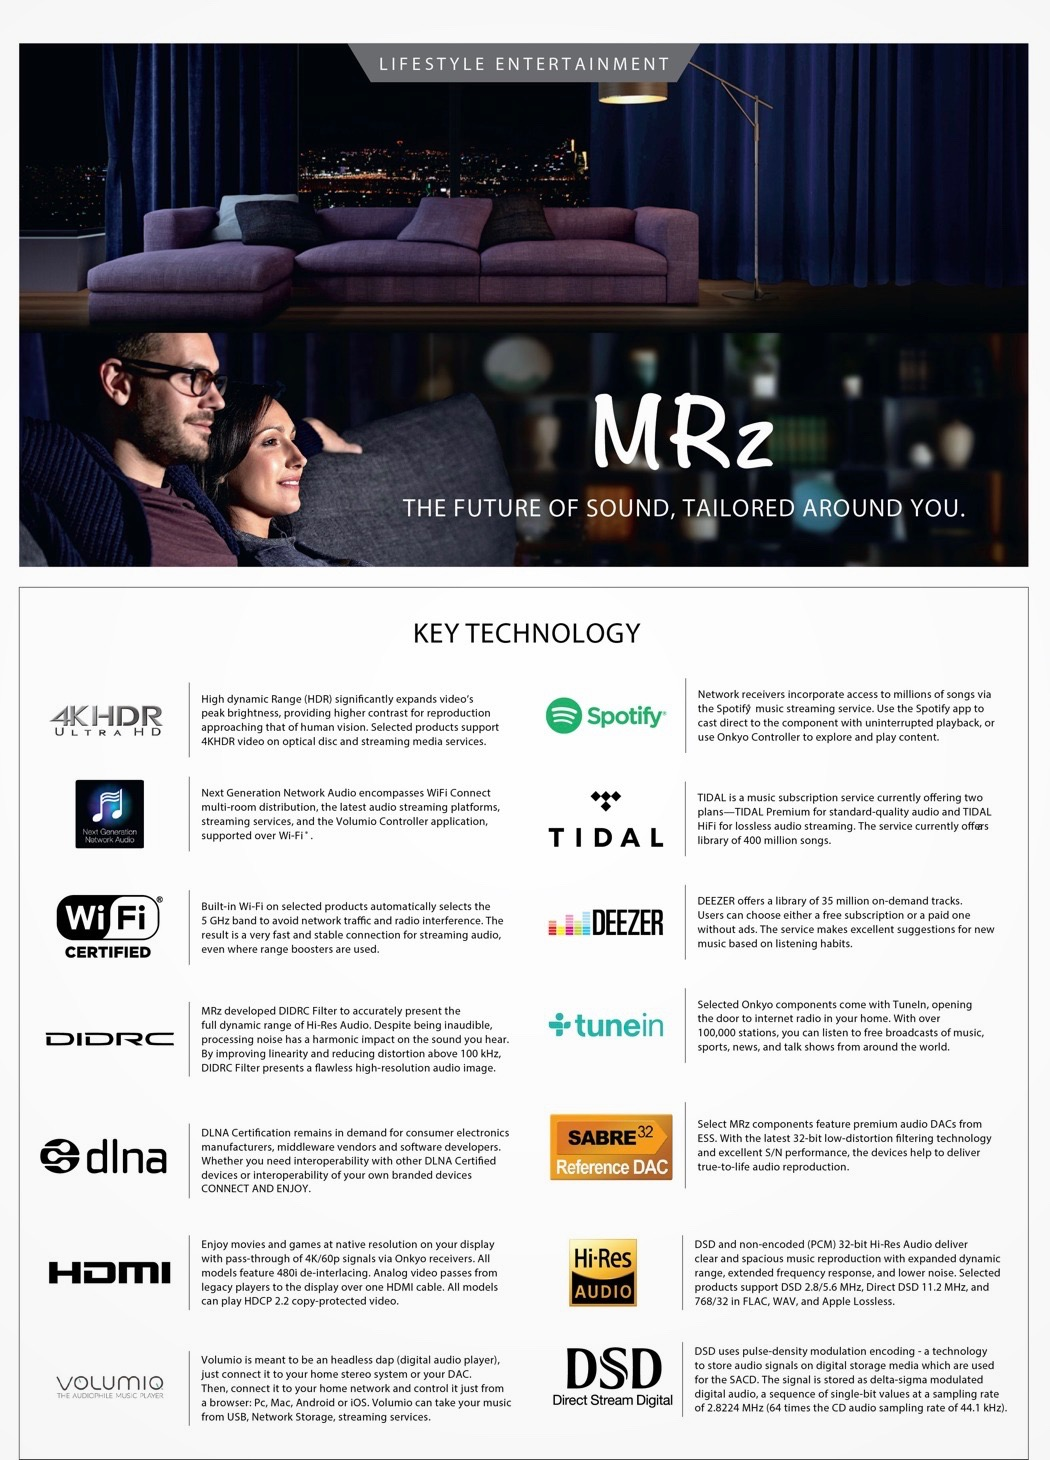 mrz_music_streaming_device_16